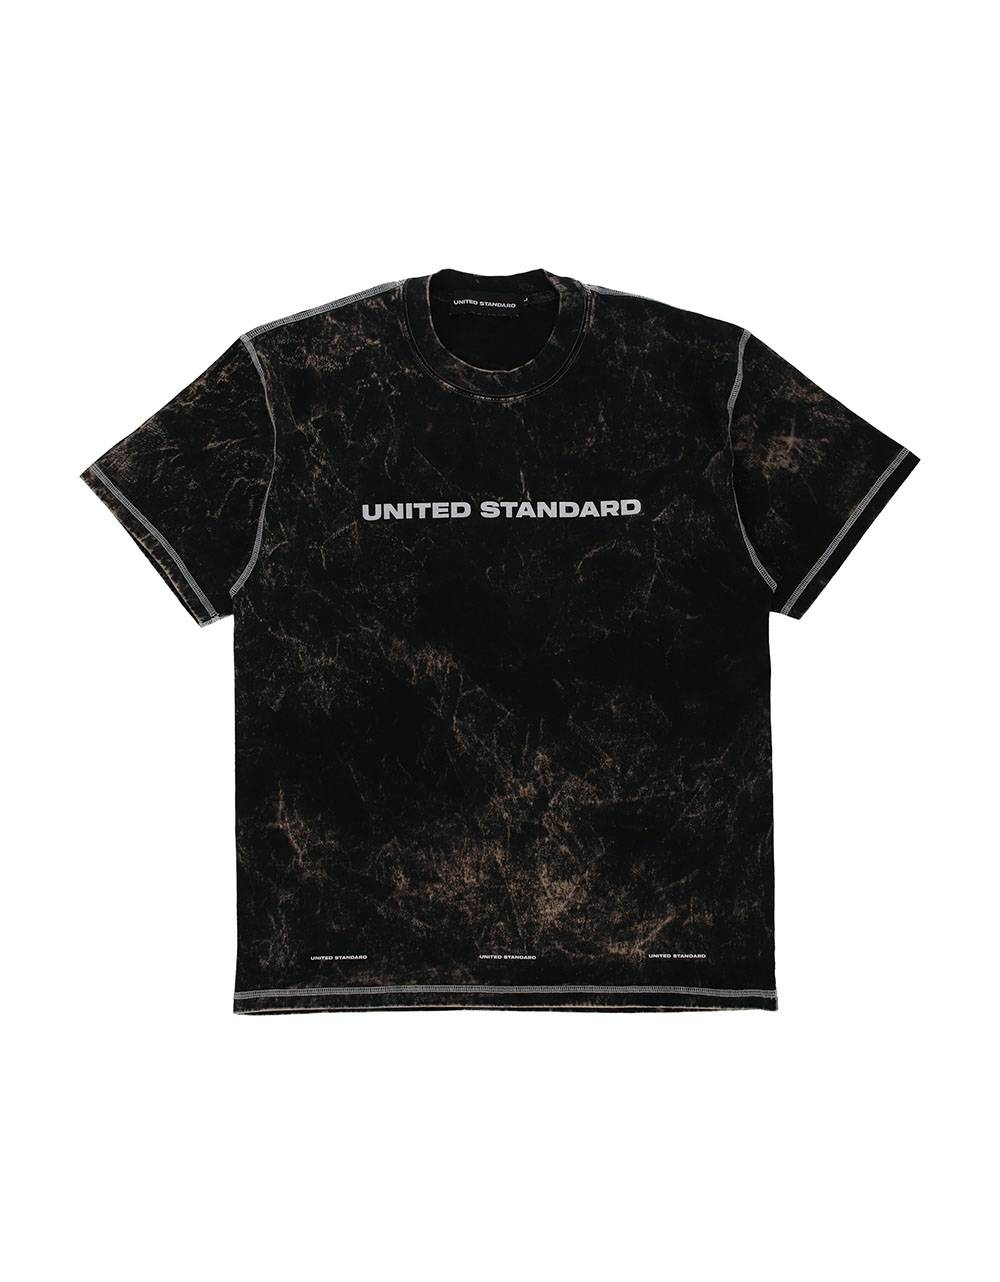 United Standard glitch logo t-shirt - black United Standard T-shirt 77,87€